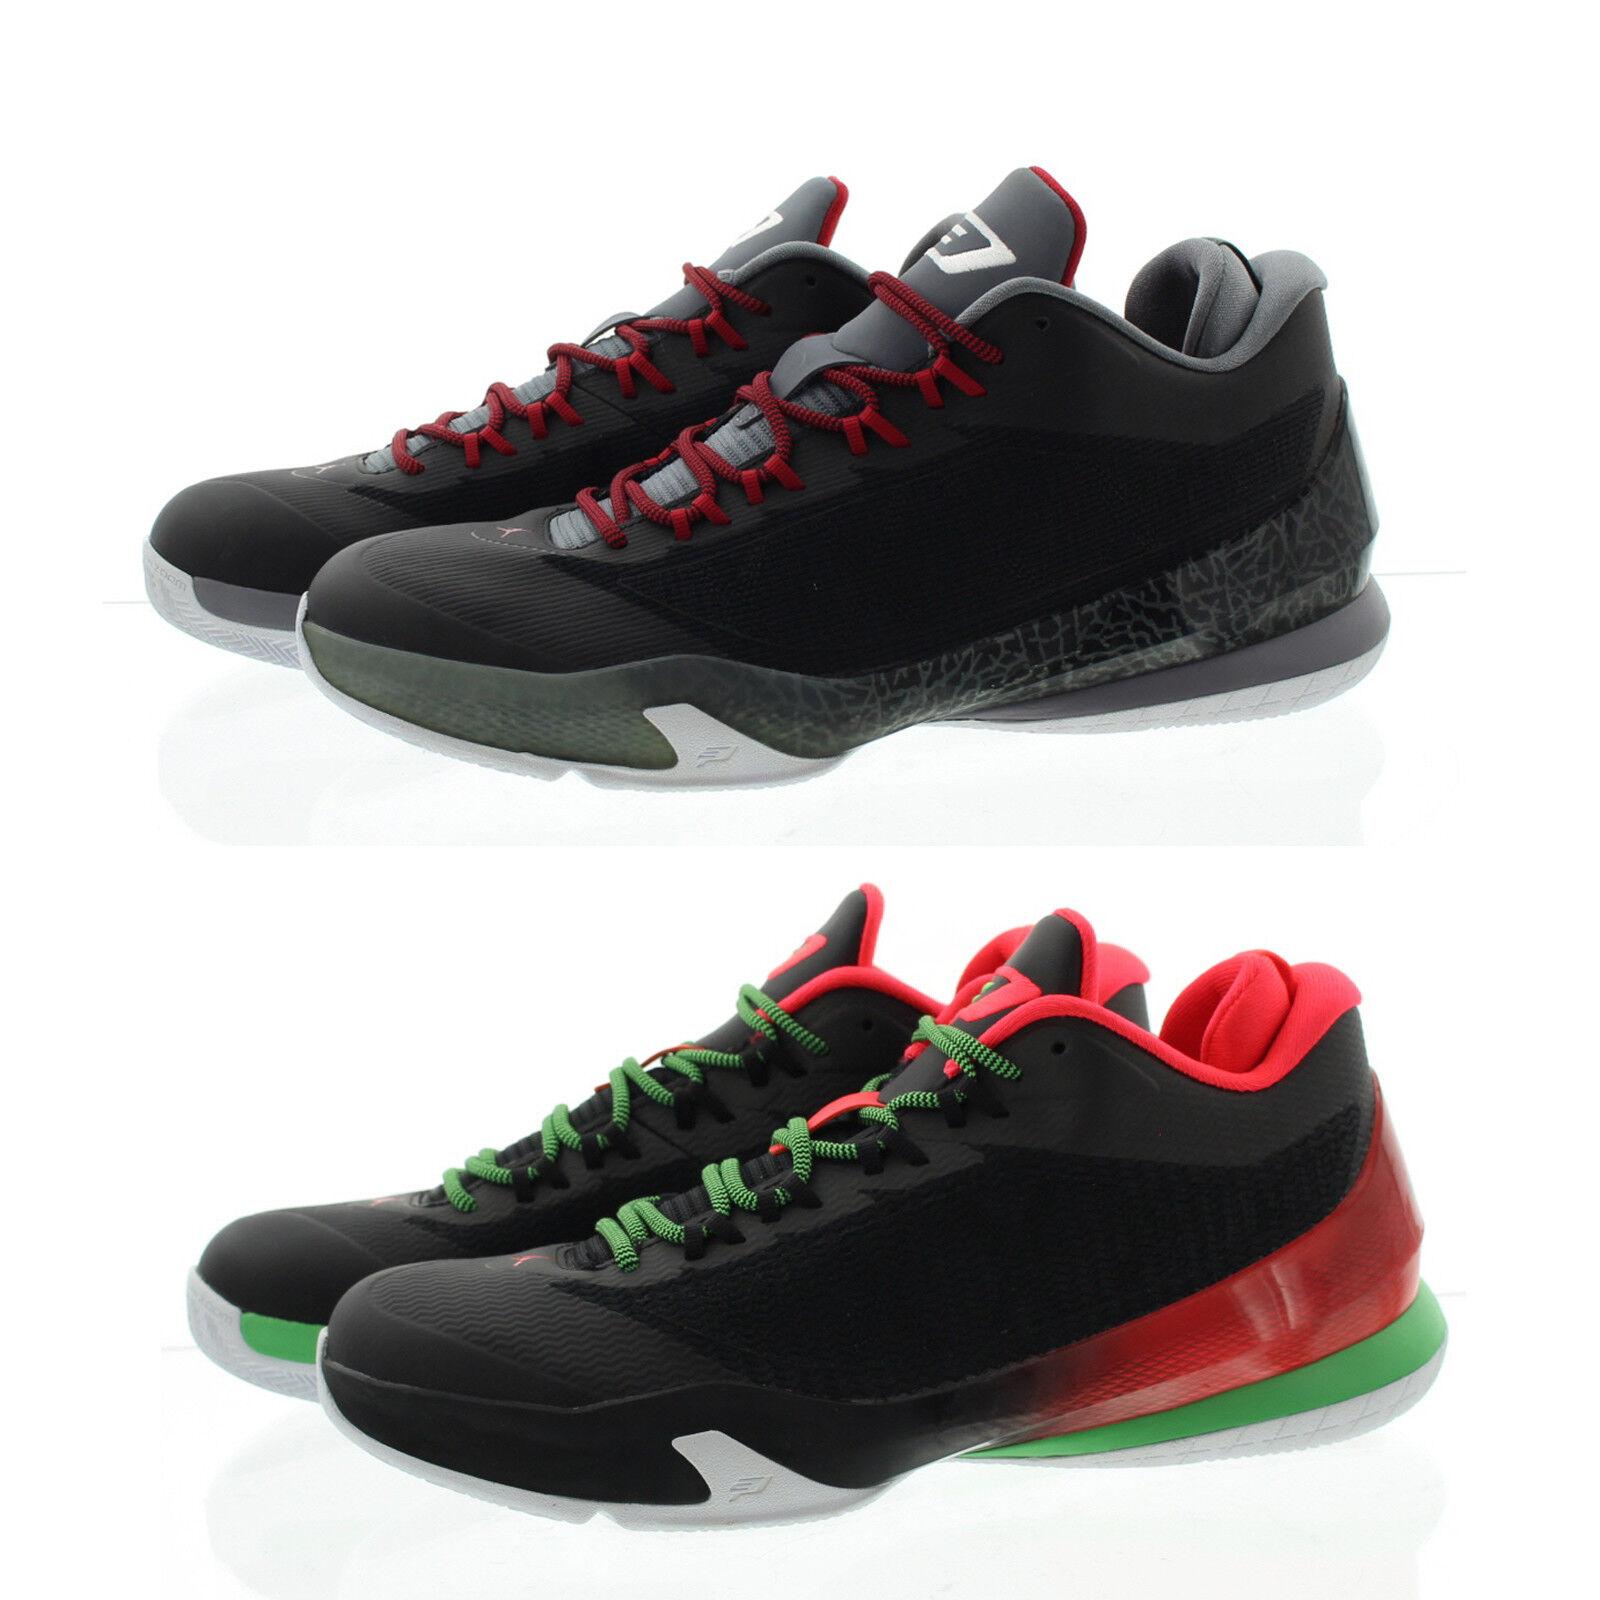 Nike 684855 Mens Air Jordan CP3 VIII Performance Basketball Shoes Sneakers